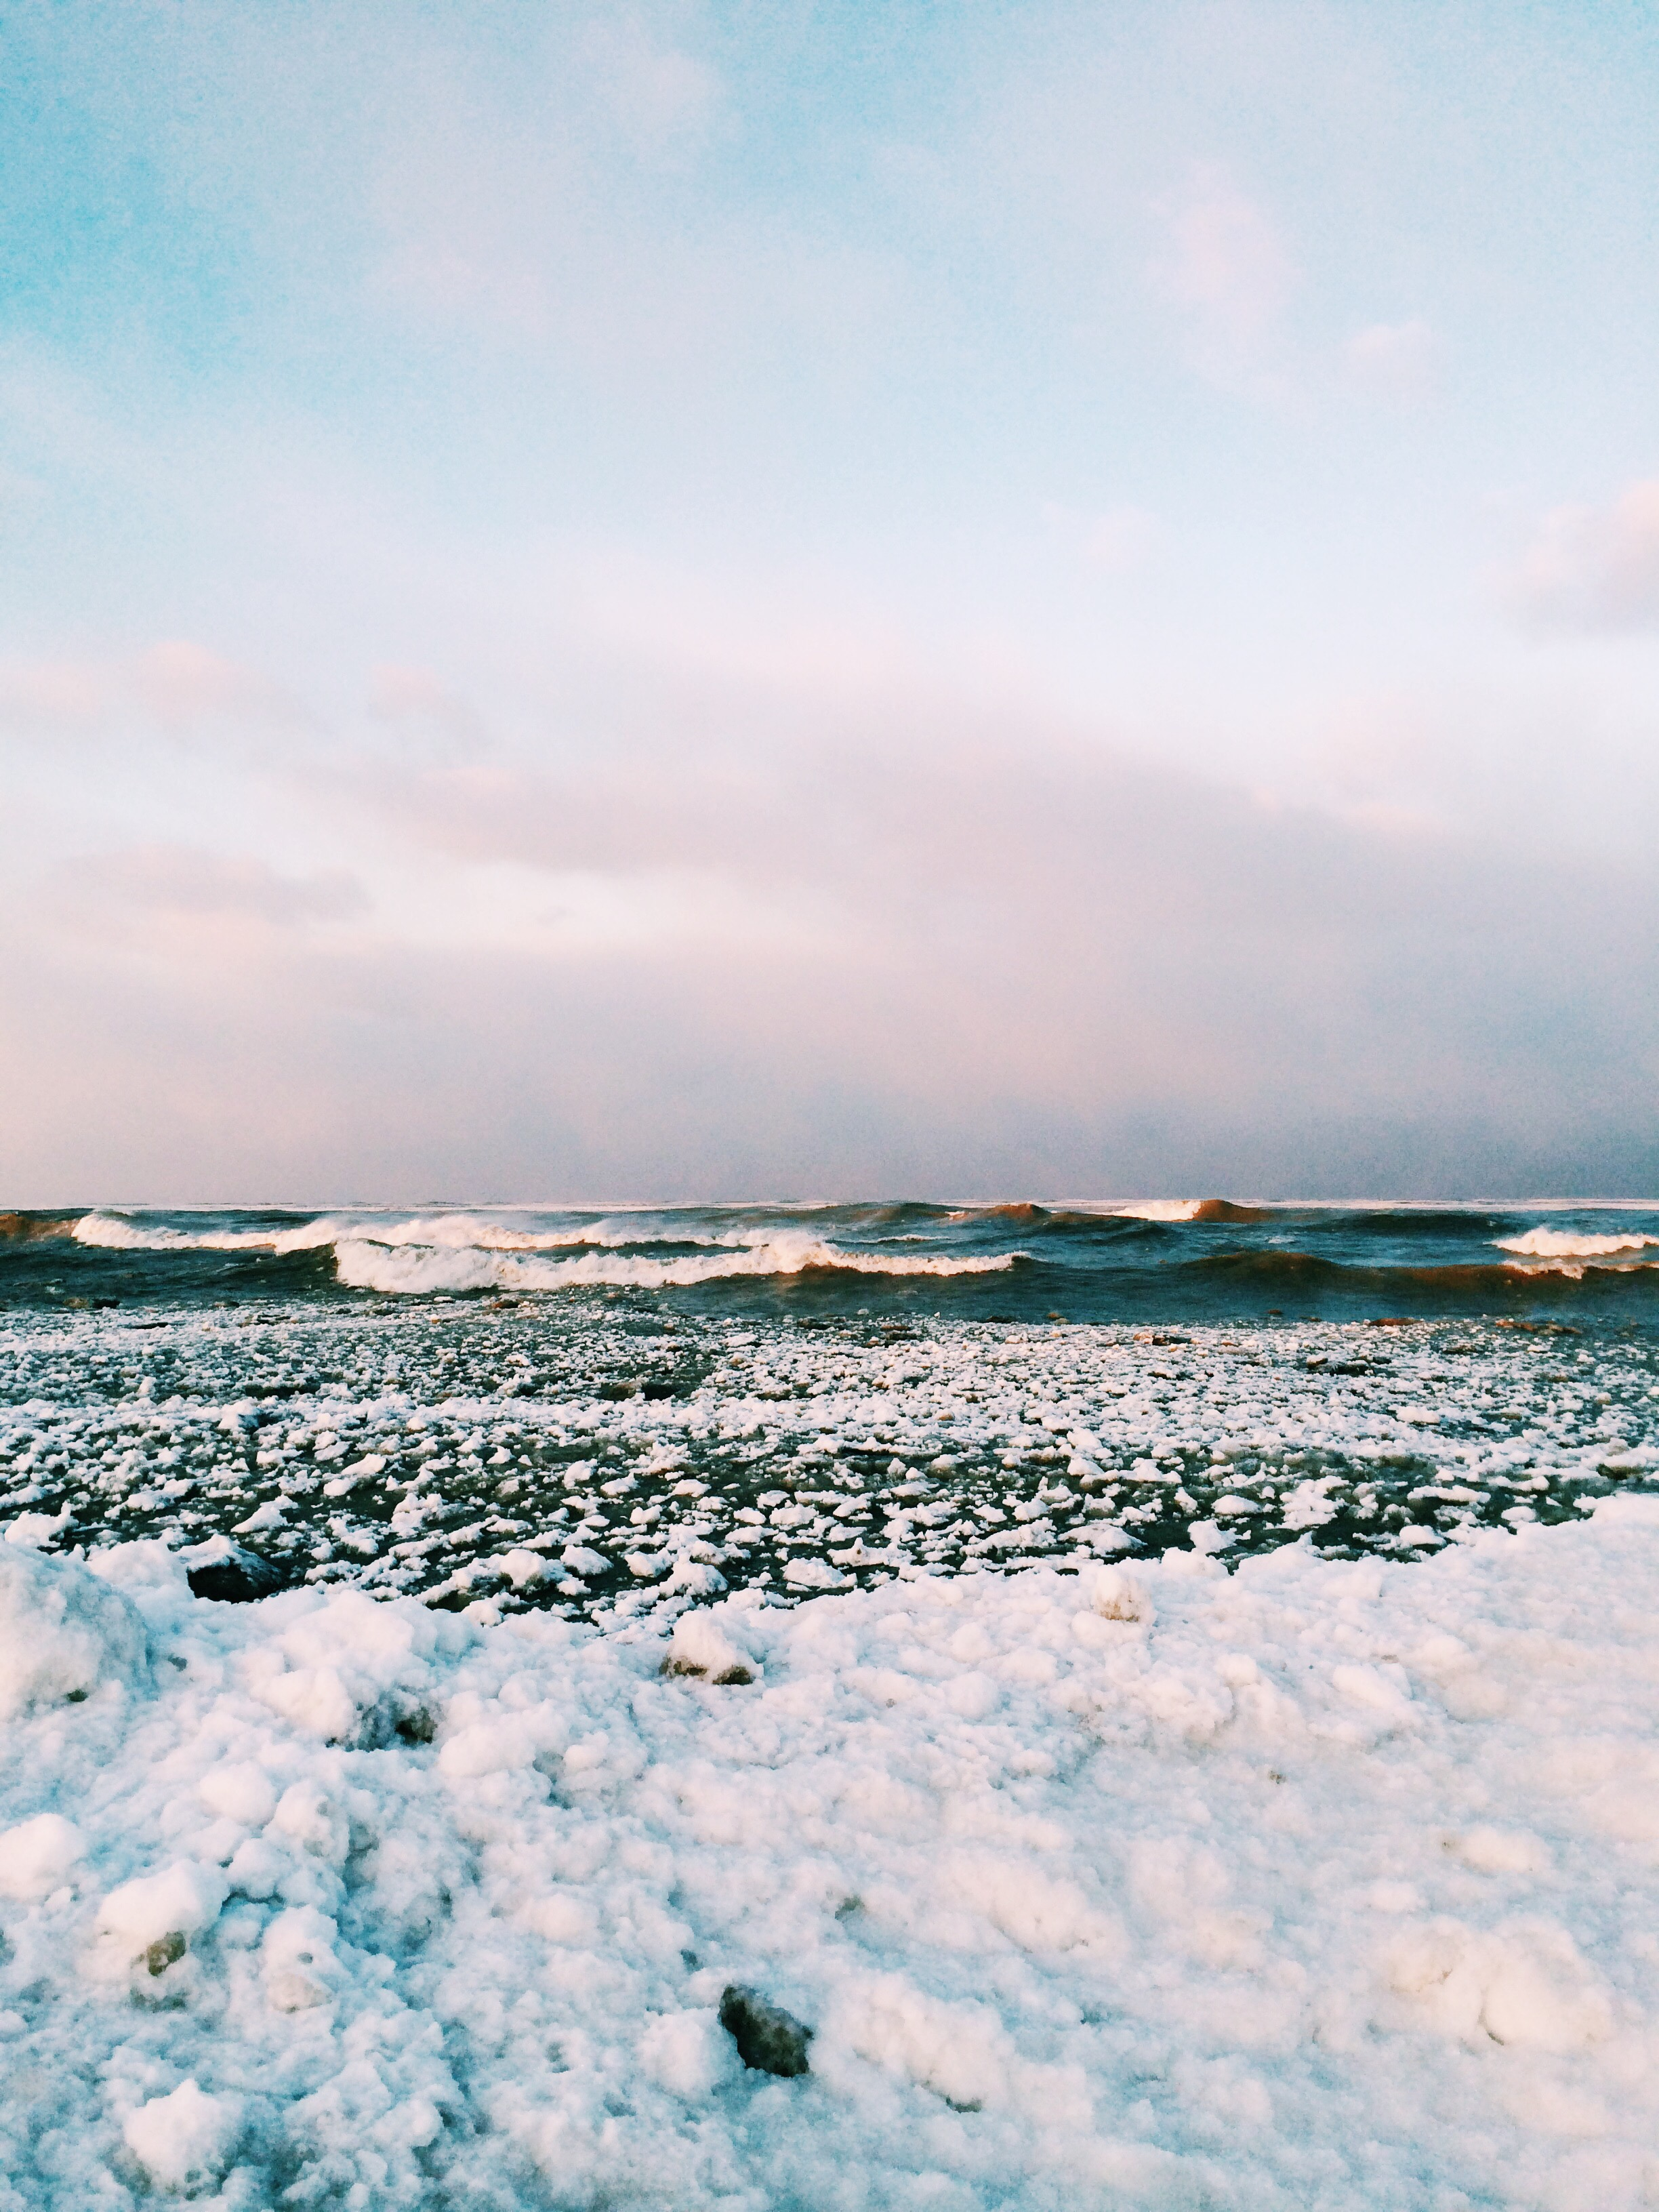 LakeMichigan_BrynaShields8